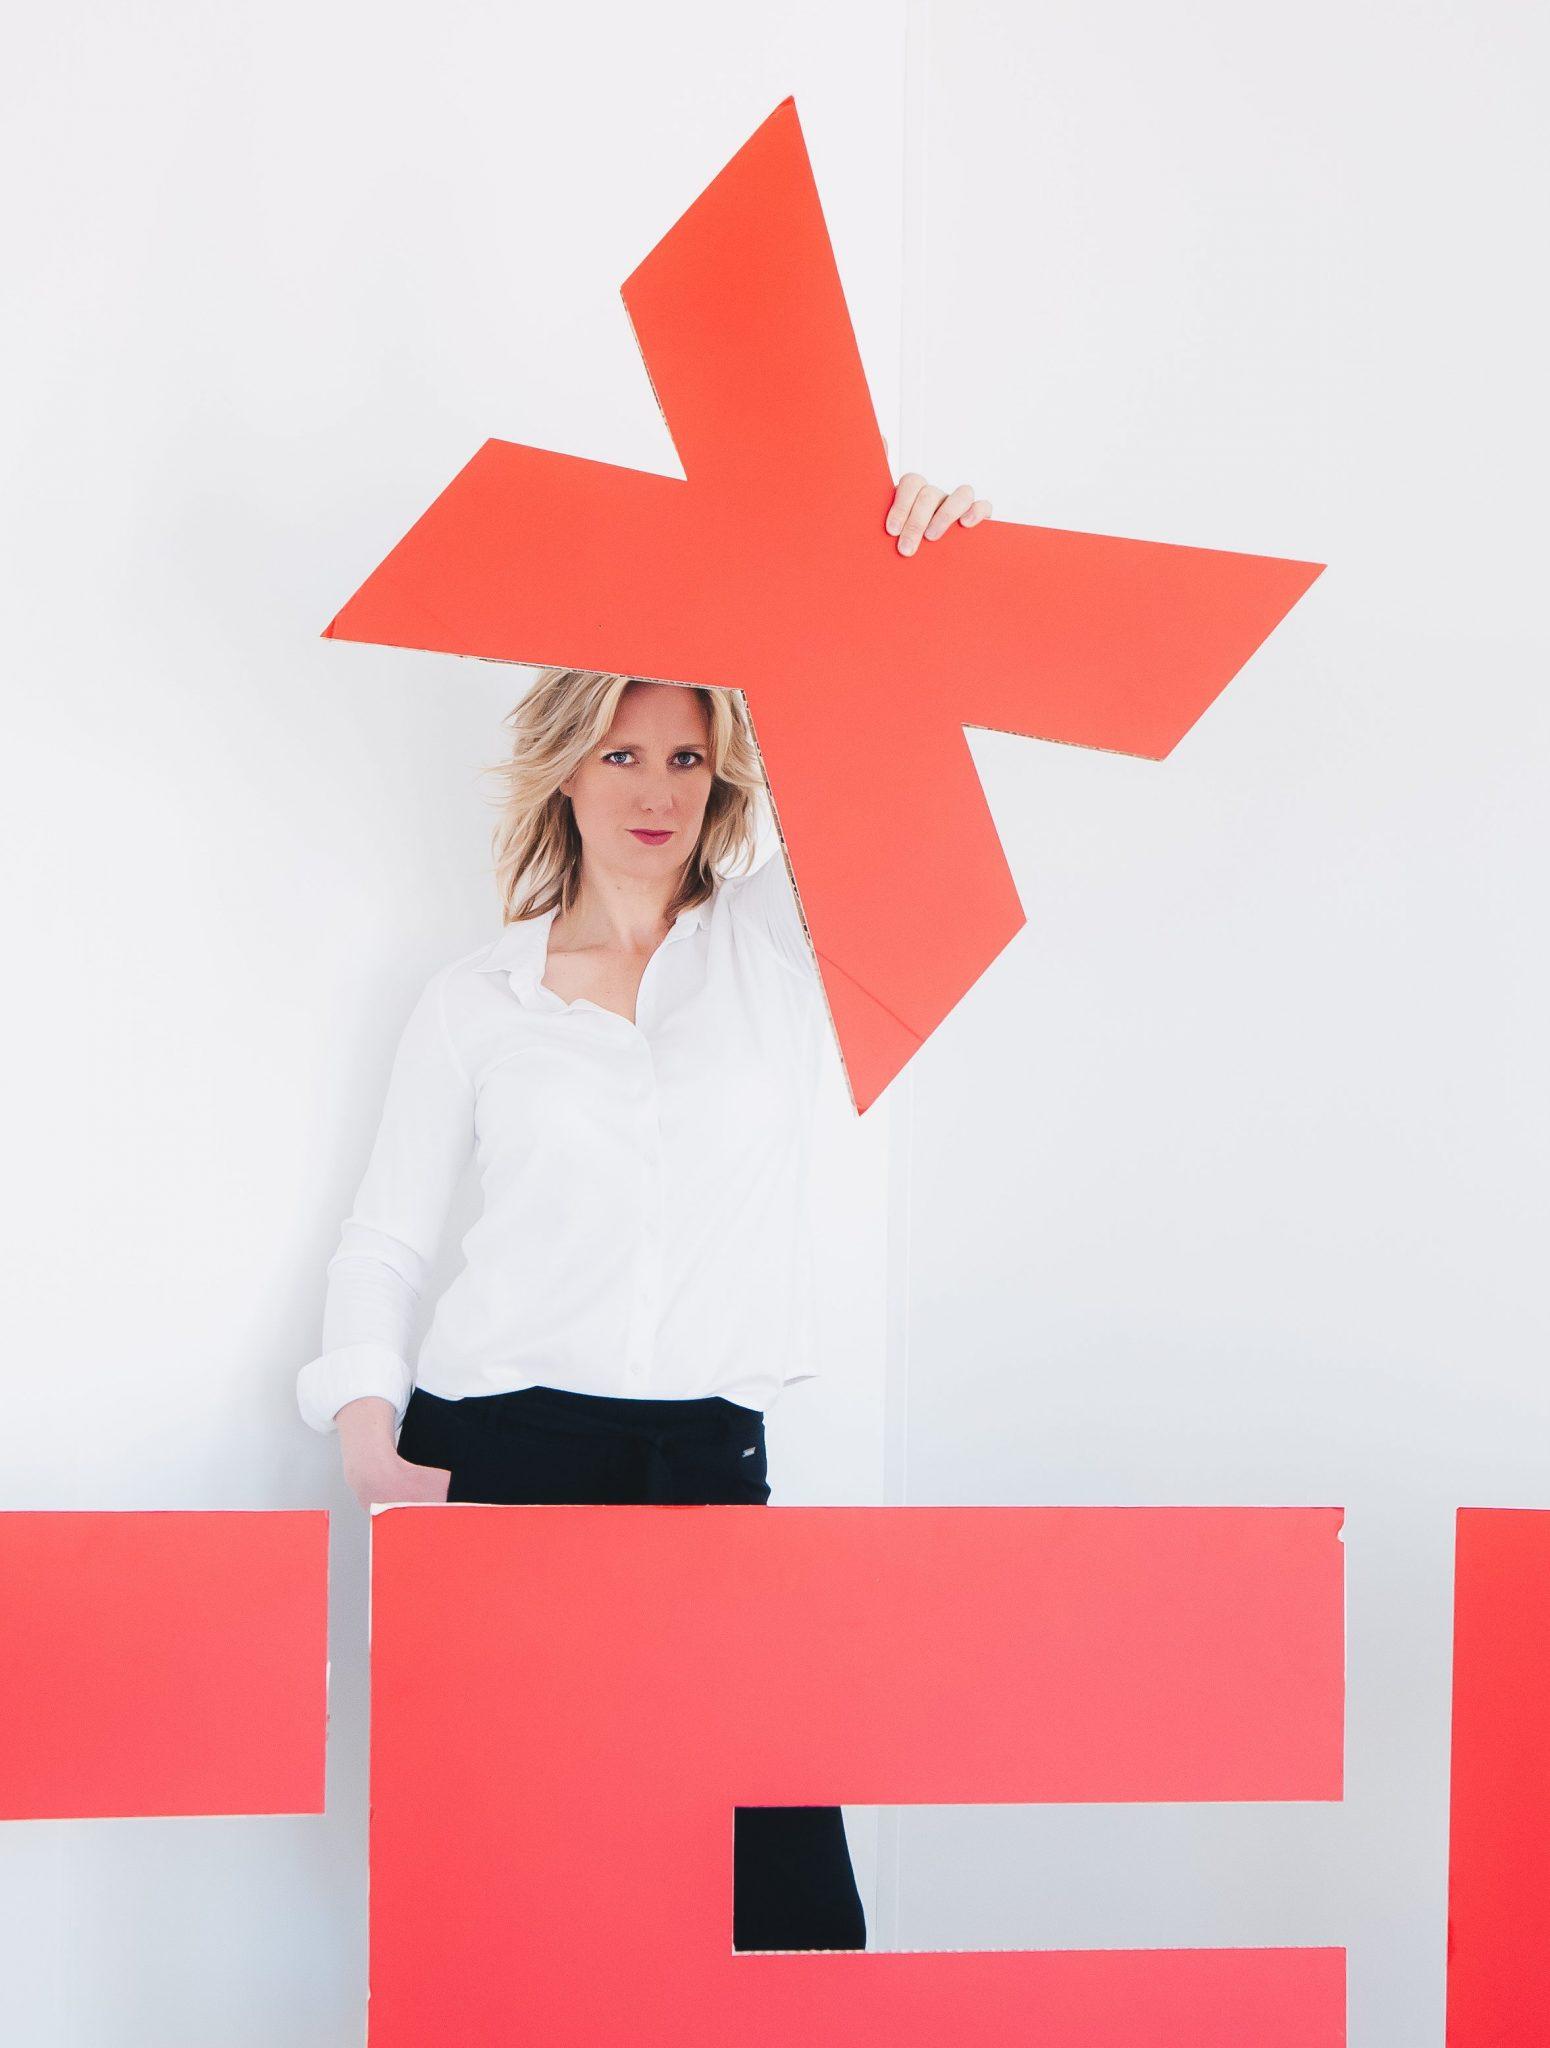 TEDx Speaker Coach Alies Dorgelo